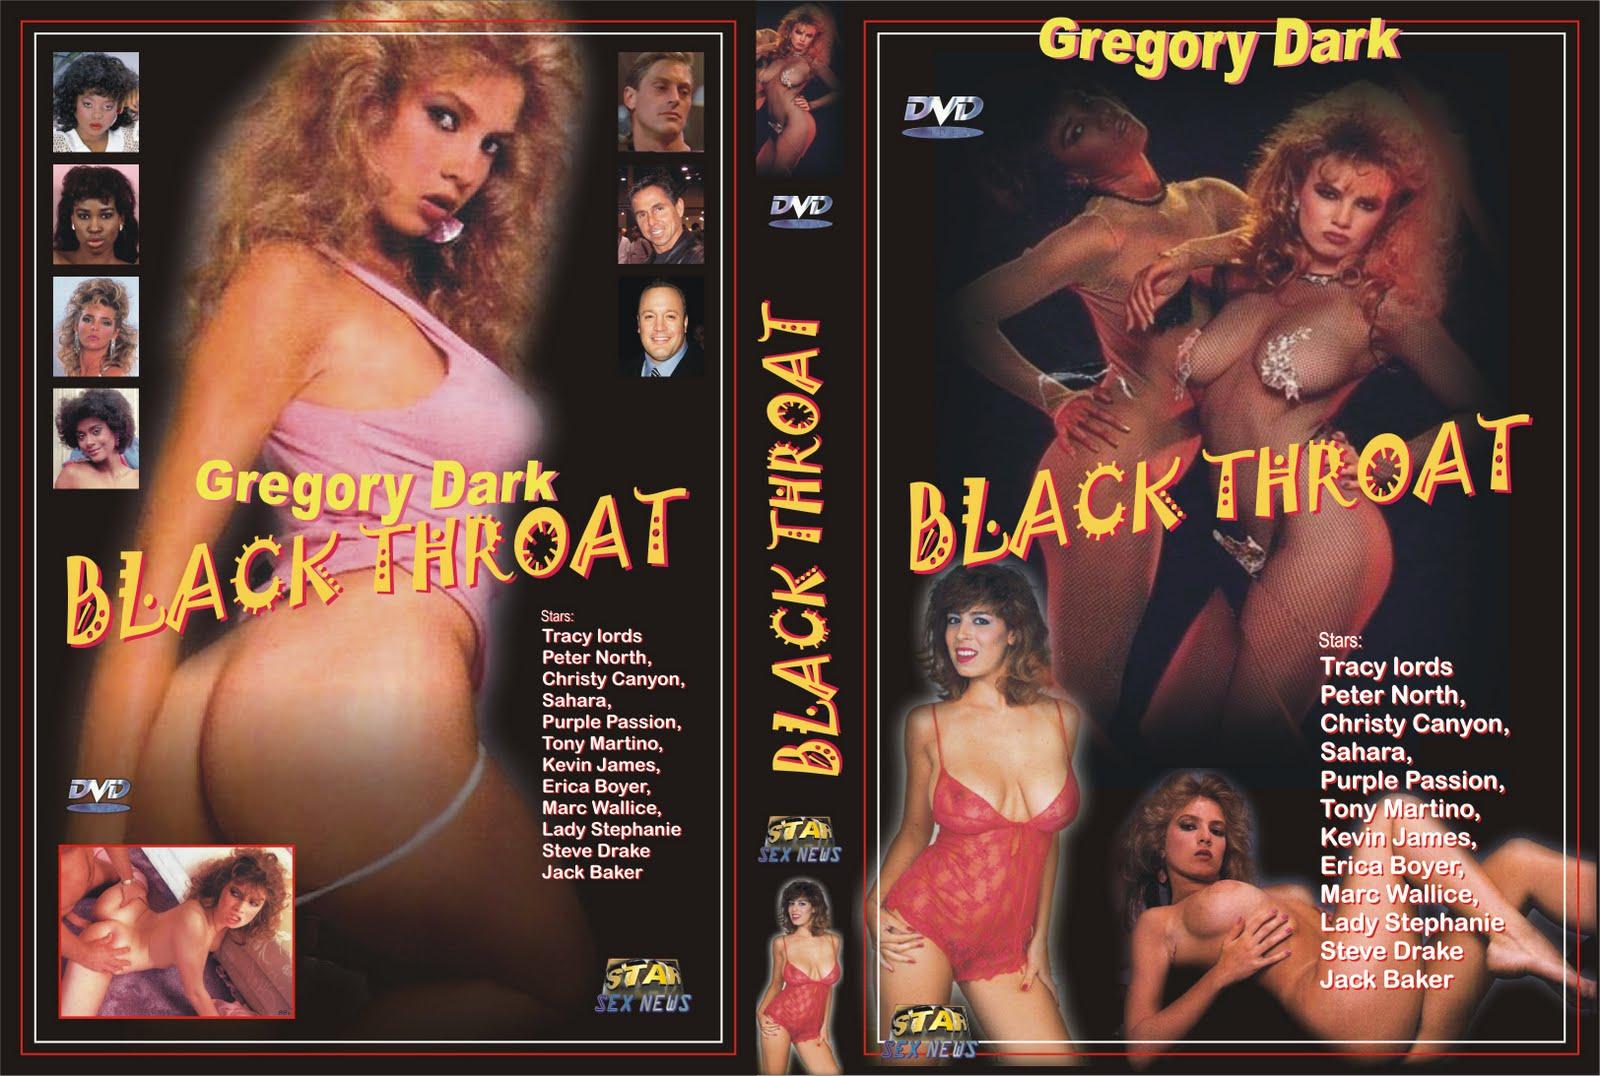 Traci lords black throat